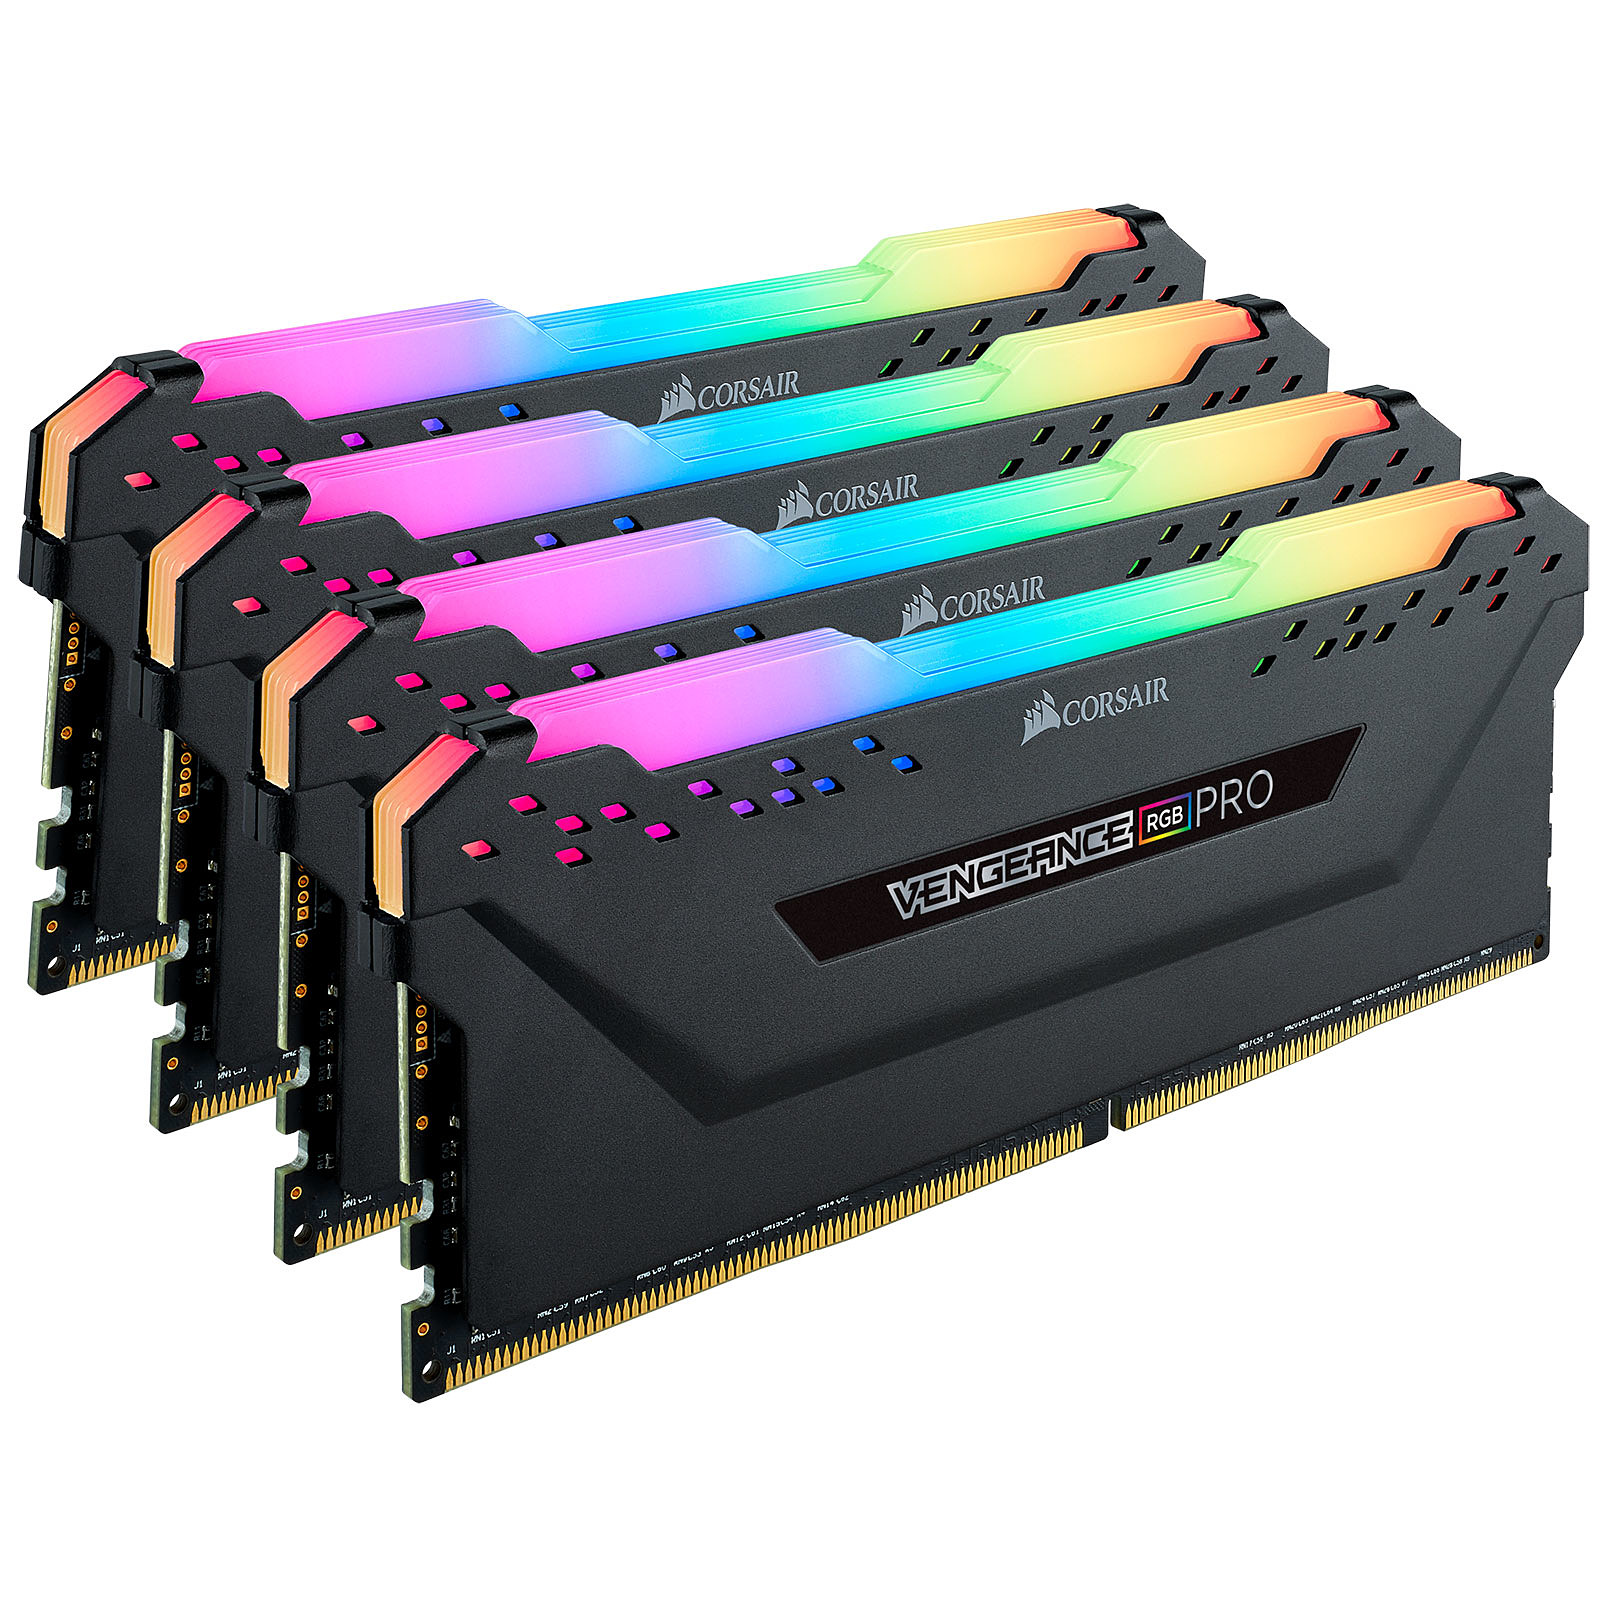 Corsair Vengeance RGB PRO Series 128GB (4x 32GB) DDR4 3200 MHz CL16